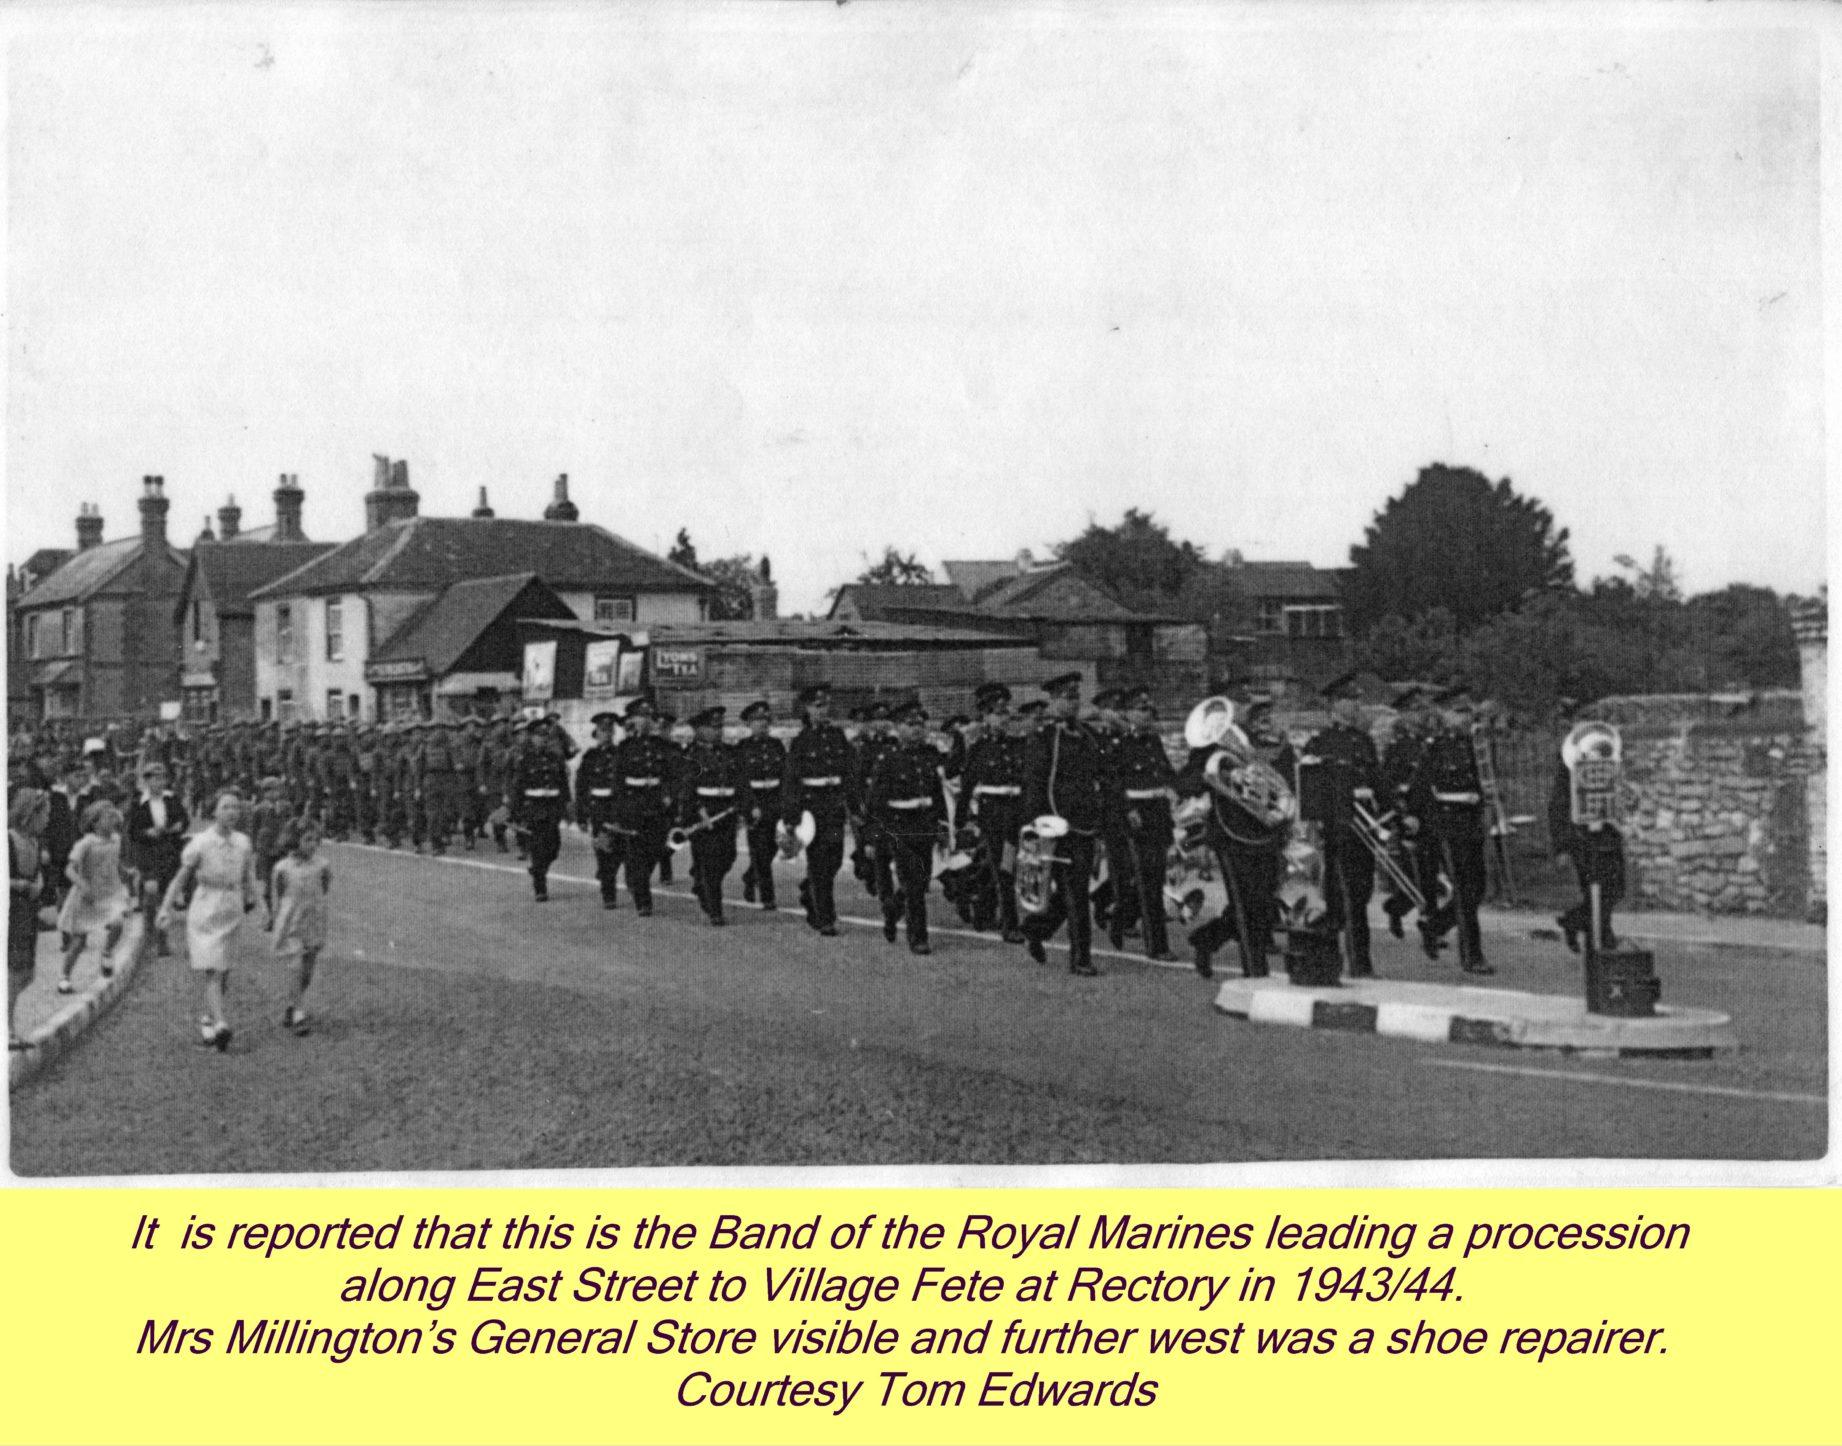 WESTBOURNE HISTORY PHOTO, EAST STREET, MARINES, FETE, WWII, MILLINGTON